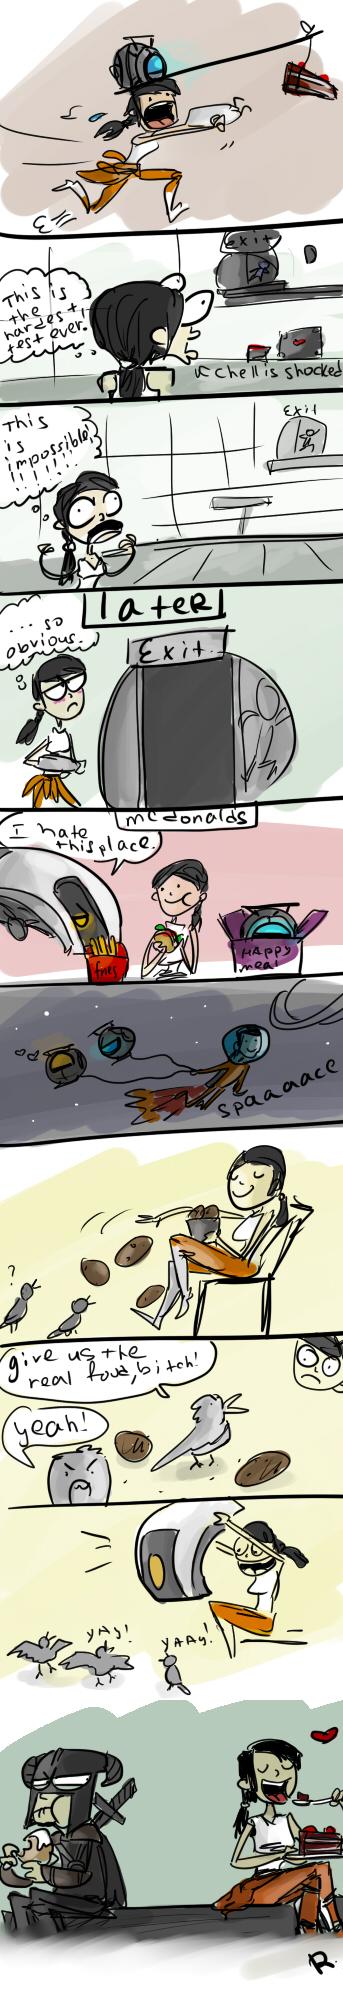 Portal 2, doodles by Ayej